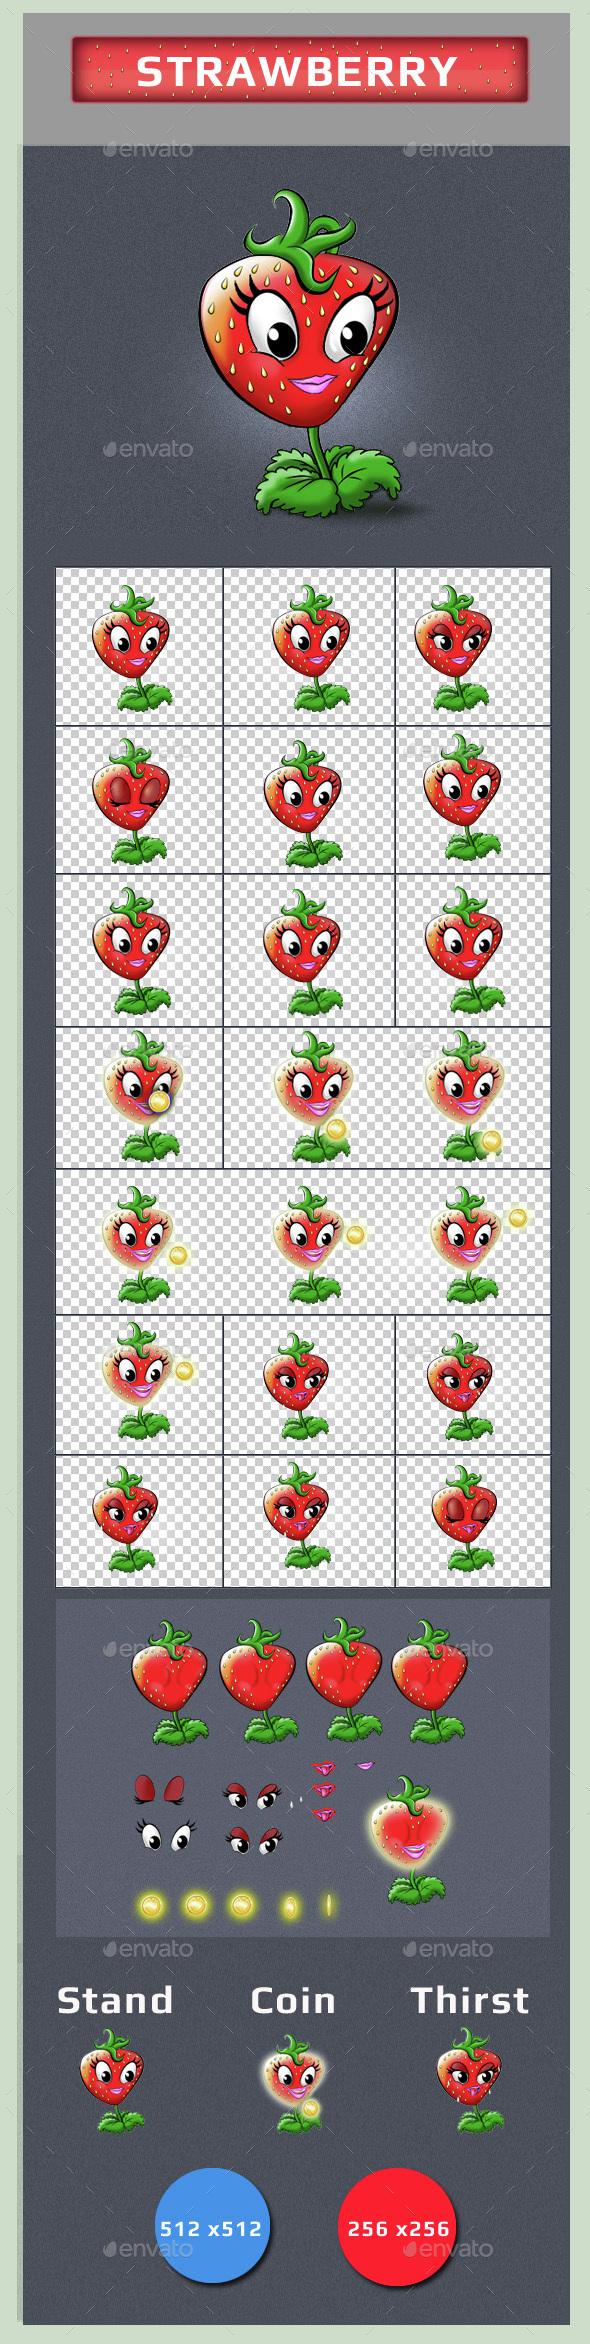 Strawberry Sprites - Sprites Game Assets